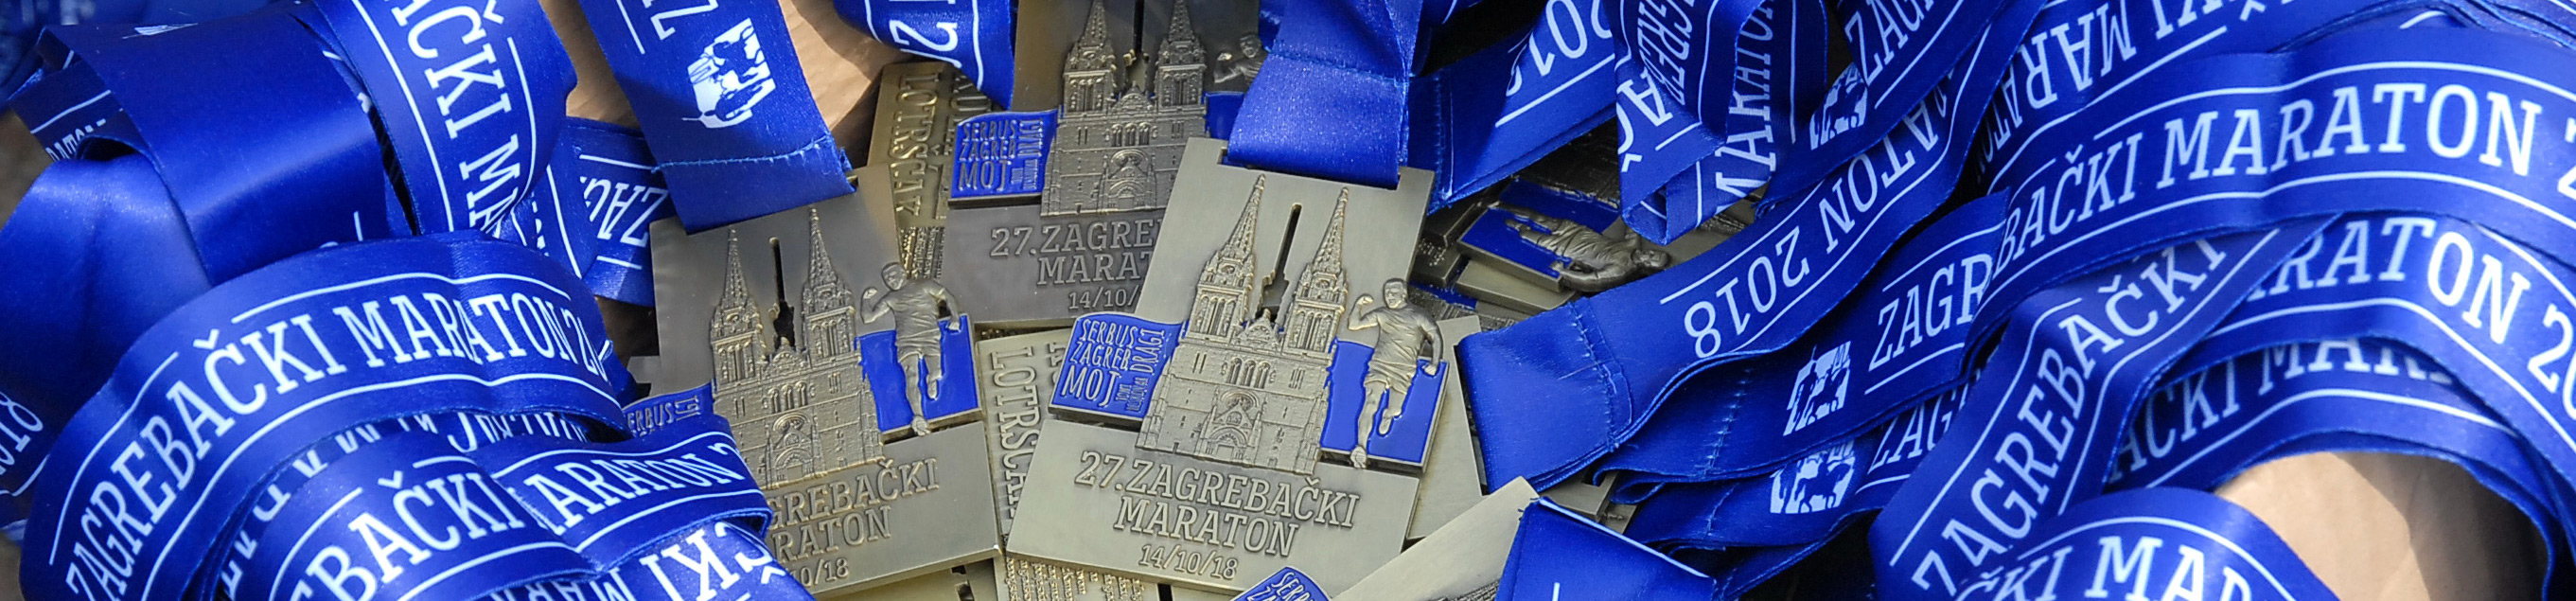 https://www.zagreb-marathon.com/wp-content/uploads/maraton06.jpg